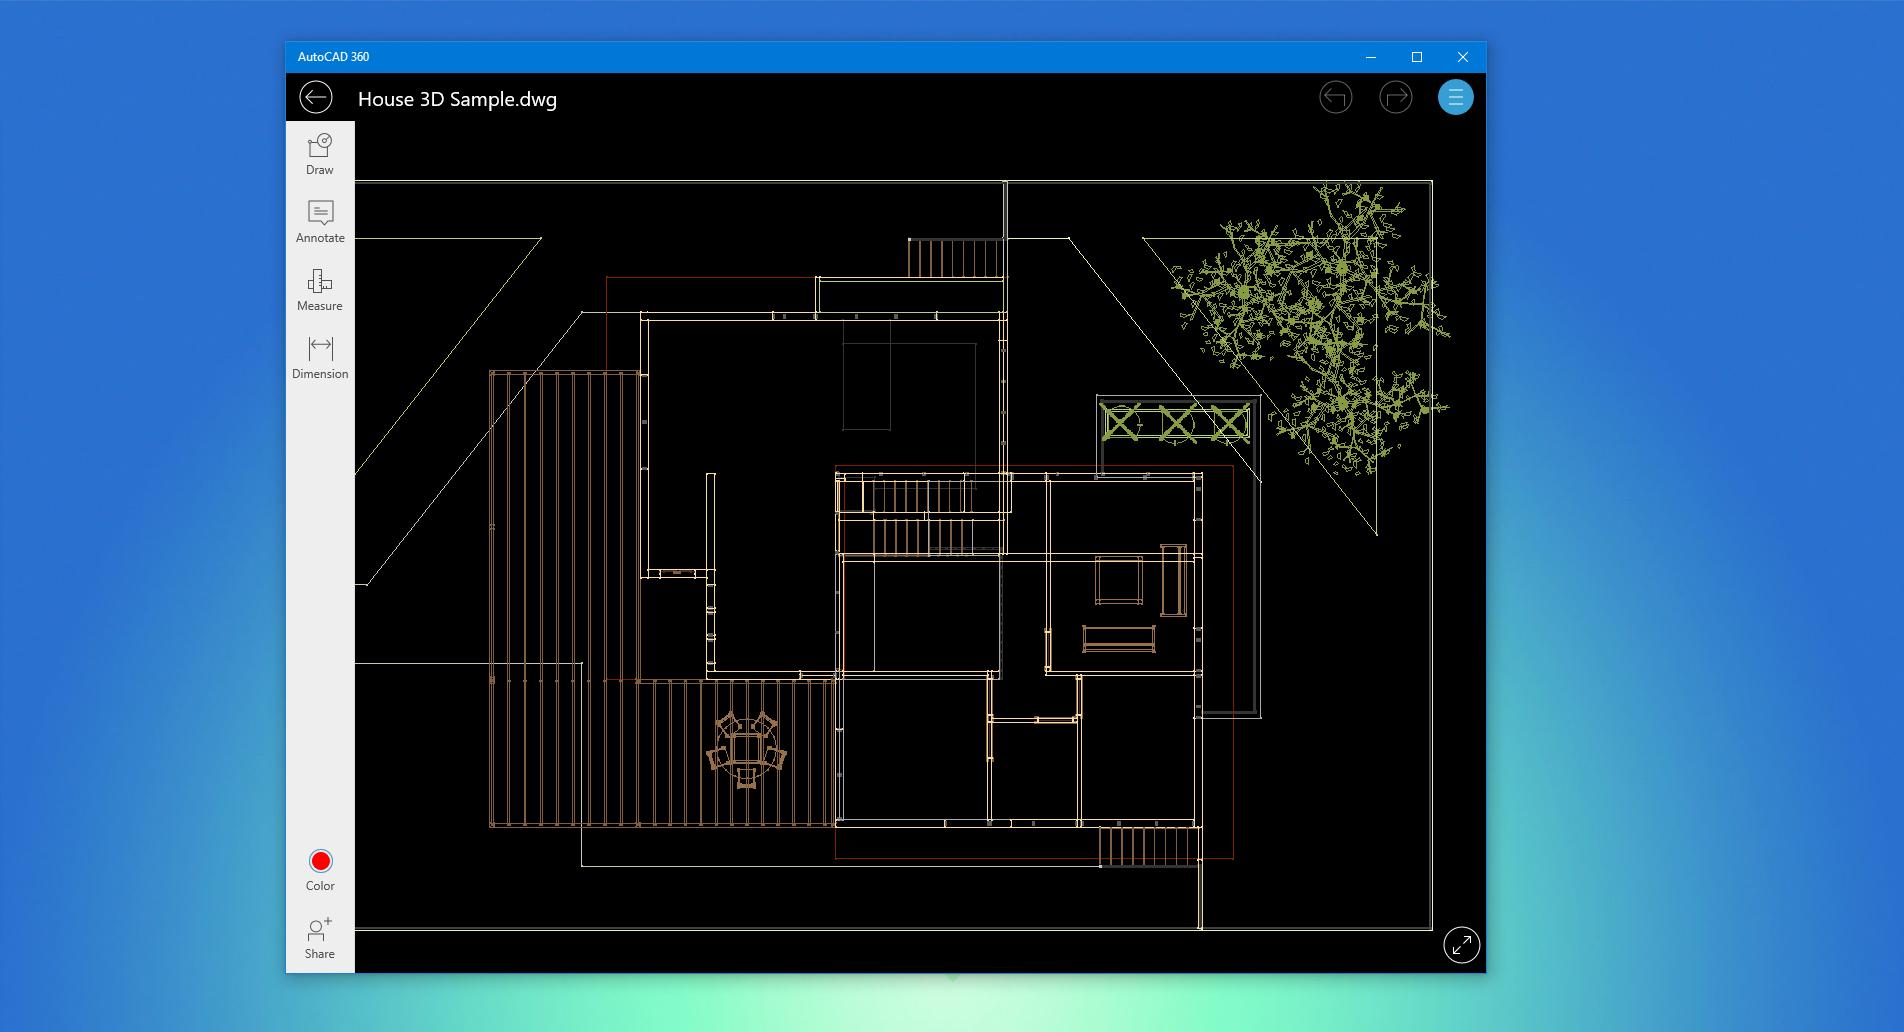 Autodesk's AutoCAD 360 UWP app updated to version 4.0 - MSPoweruser